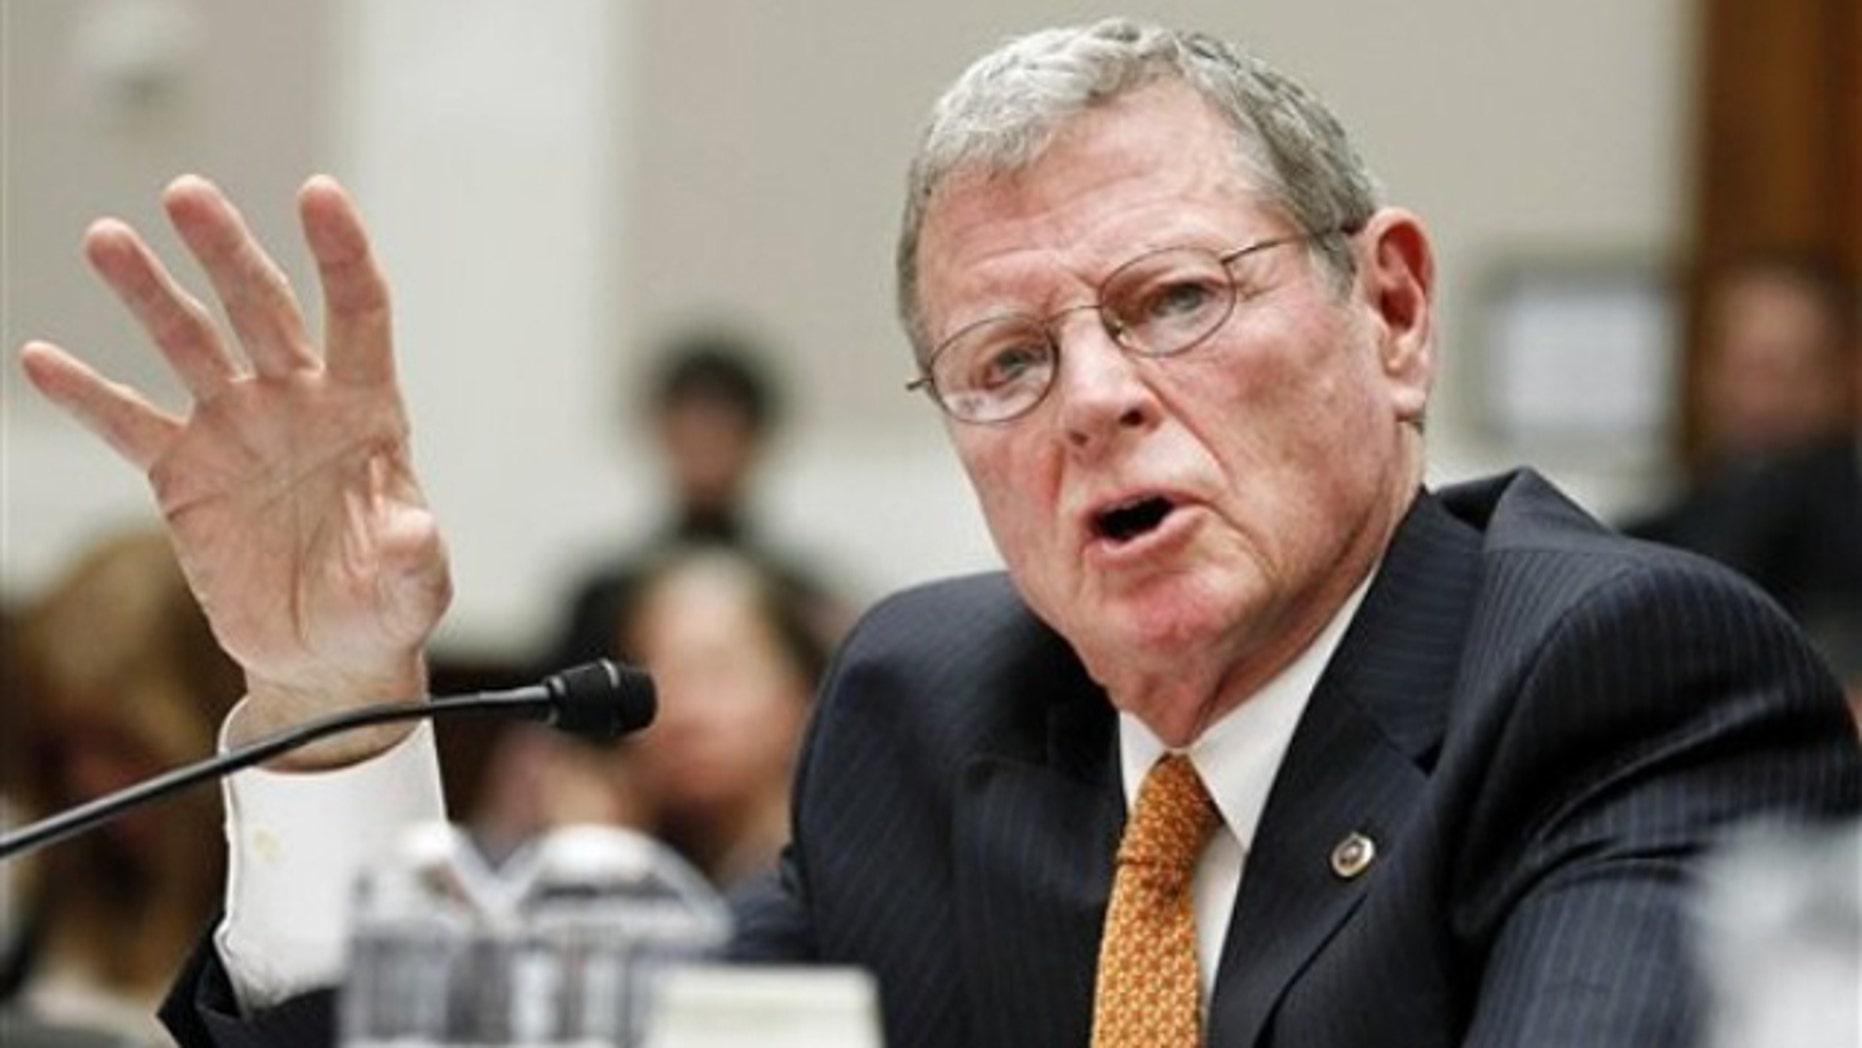 FILE: Feb. 9, 2011: Sen. James Inhofe testifies on Capitol Hill, Washington, D.C.